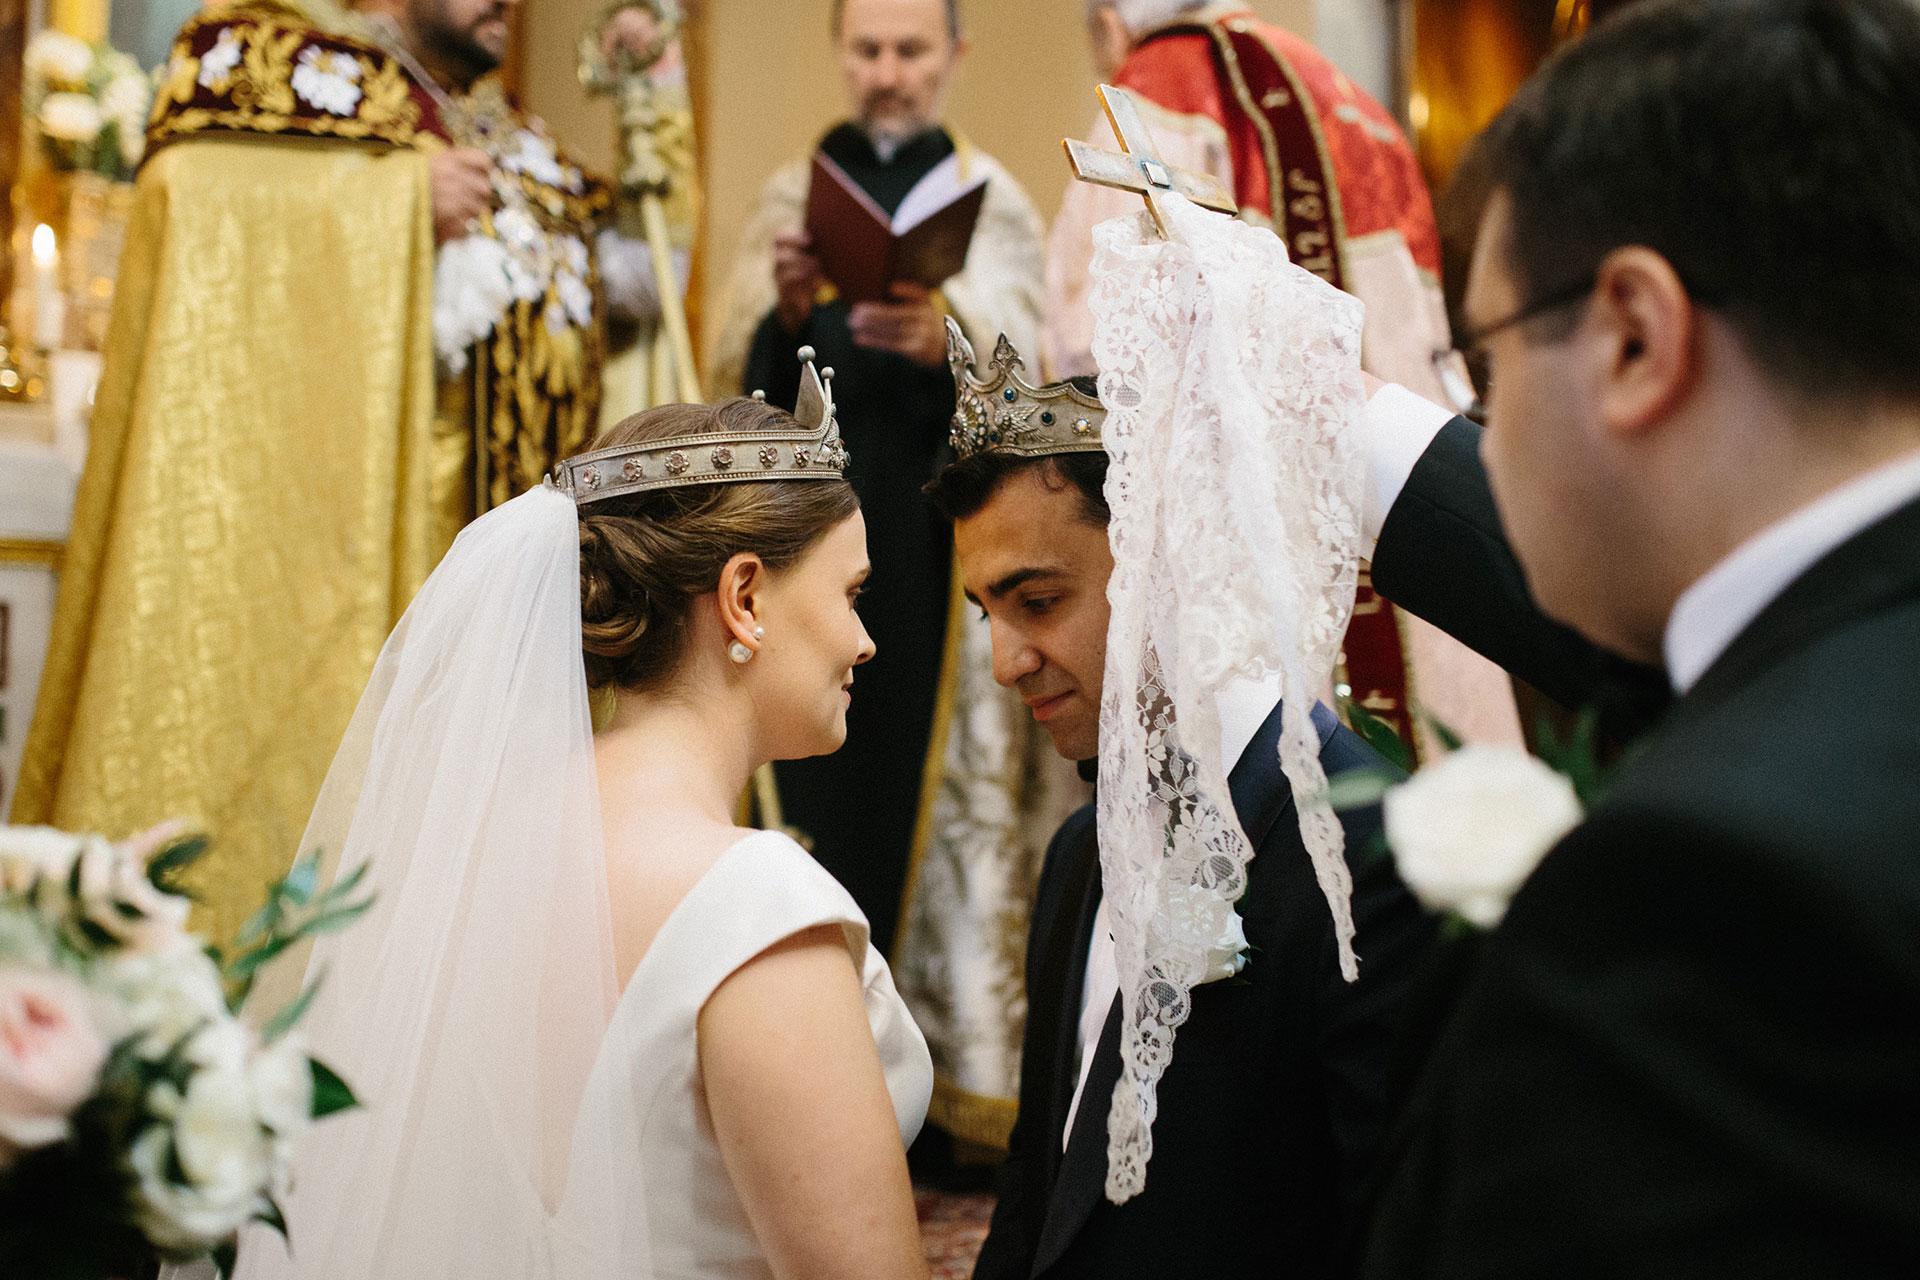 Syon-Park-Wedding-Photographer--_-Michael-Newington-Gray-154.jpg